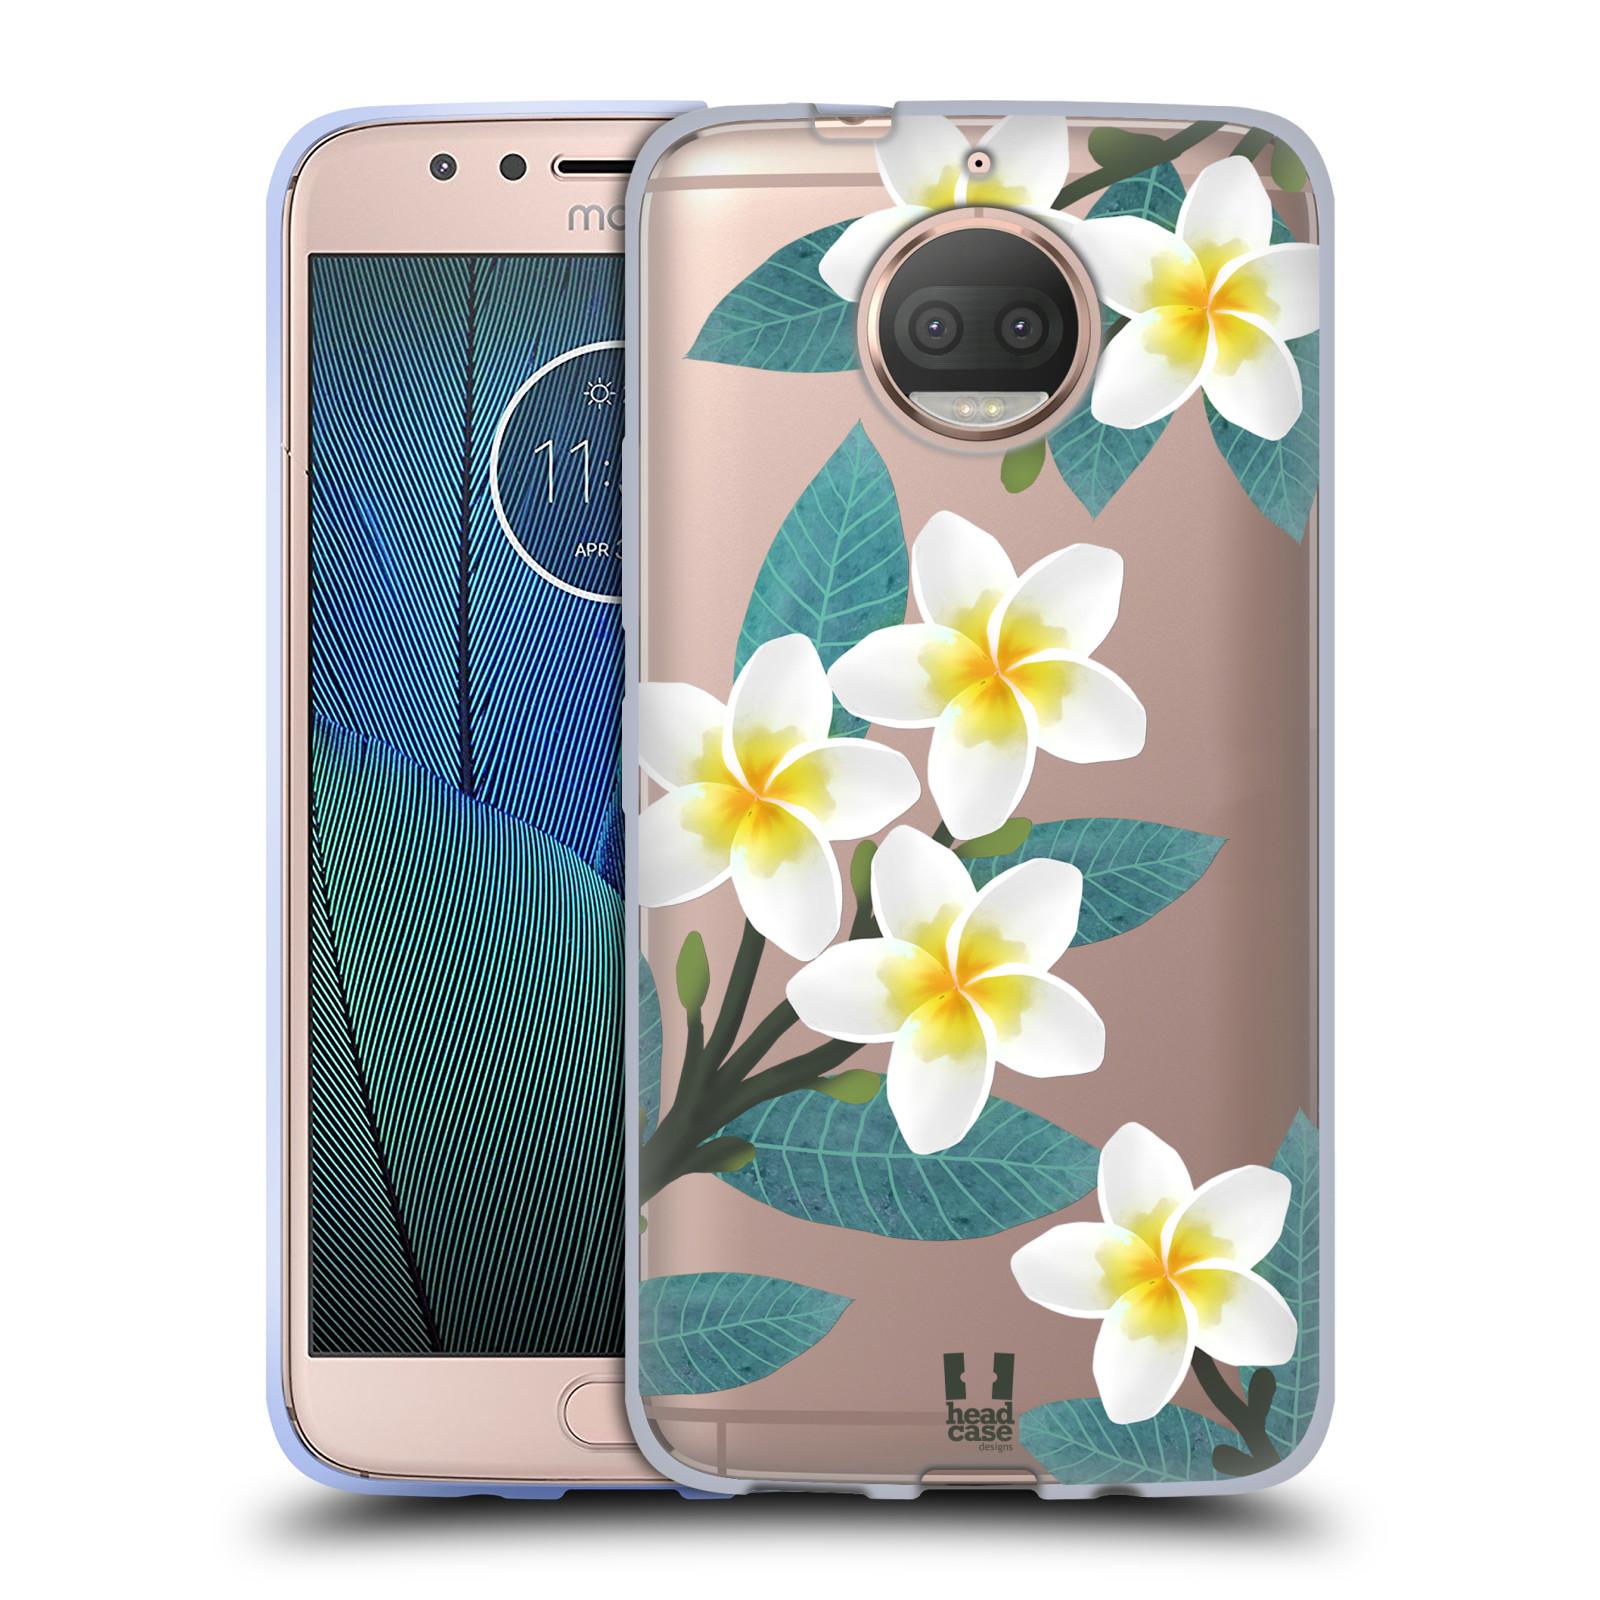 HEAD CASE silikonový obal na mobil Lenovo Moto G5s PLUS květinové vzory Plumérie